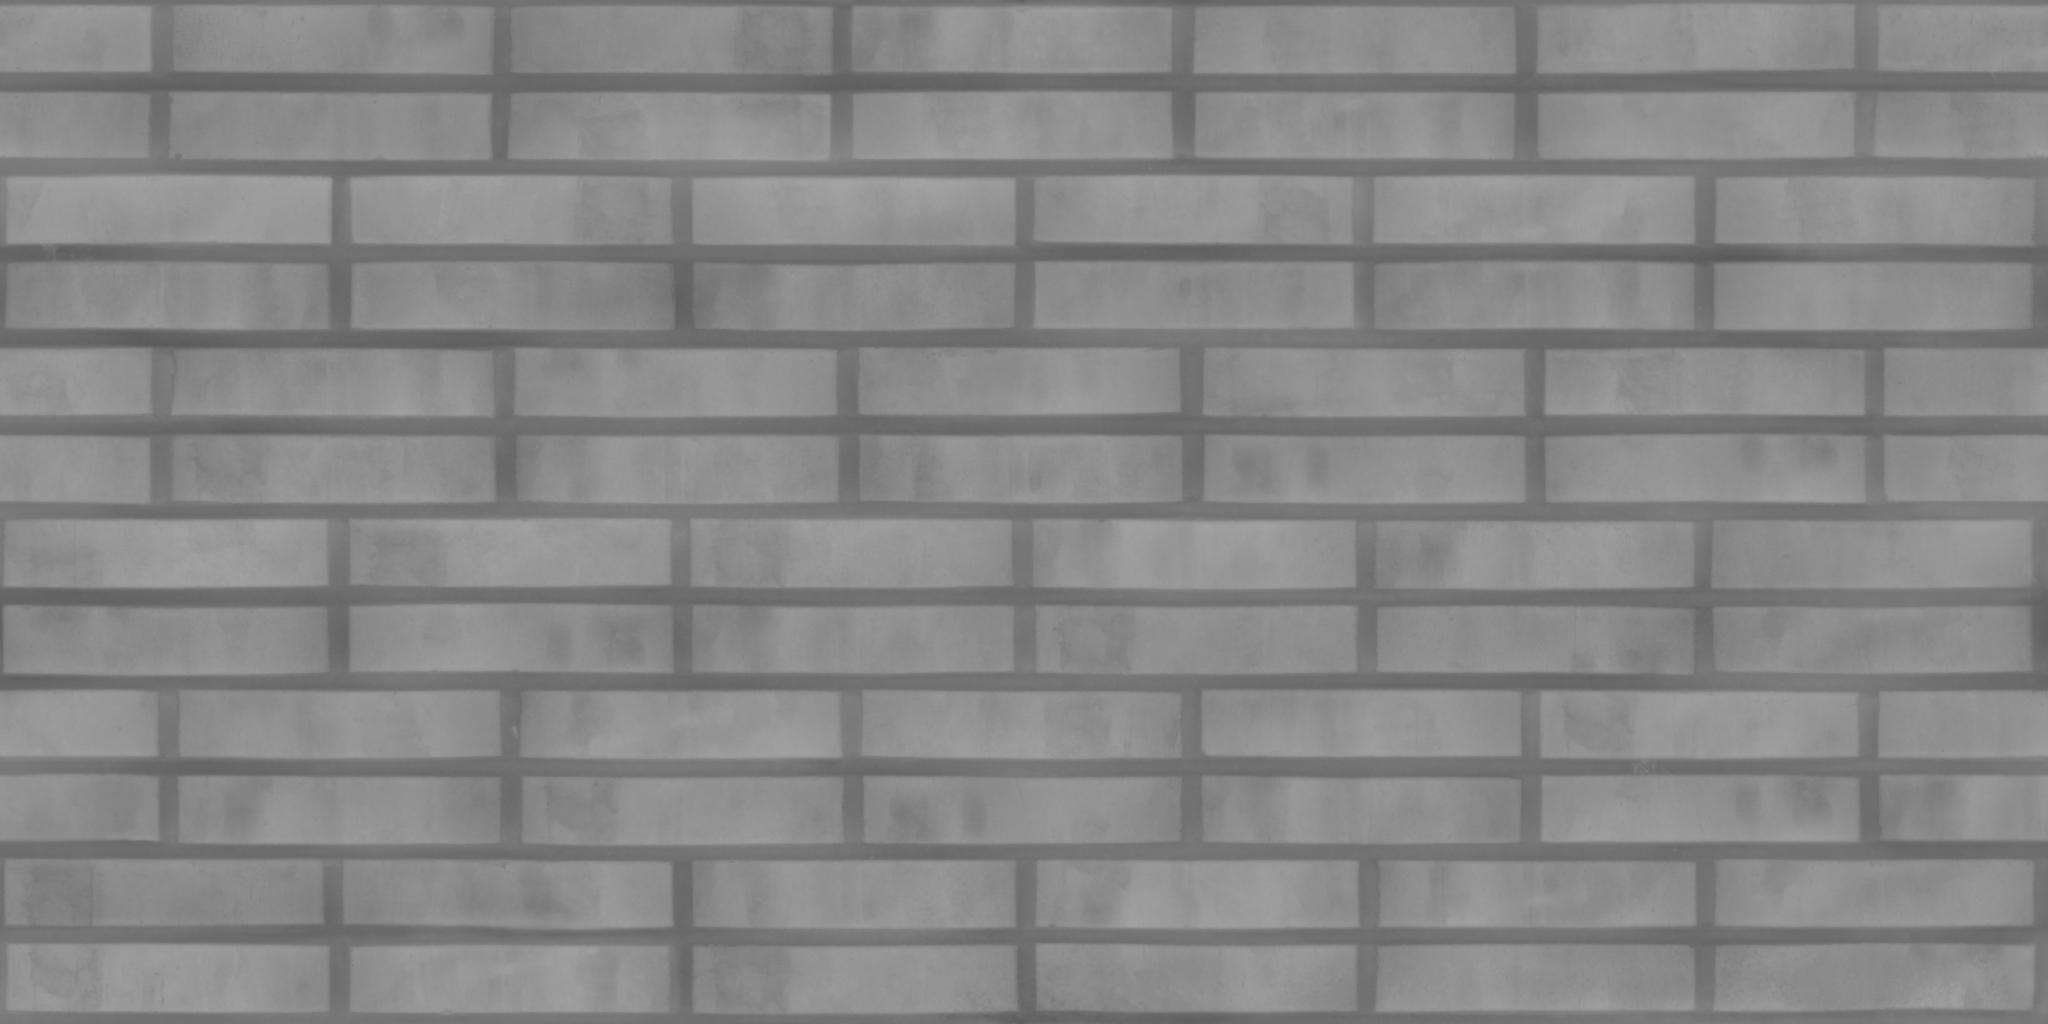 3D Scanned Seamless Brick Wall Dark Height Map